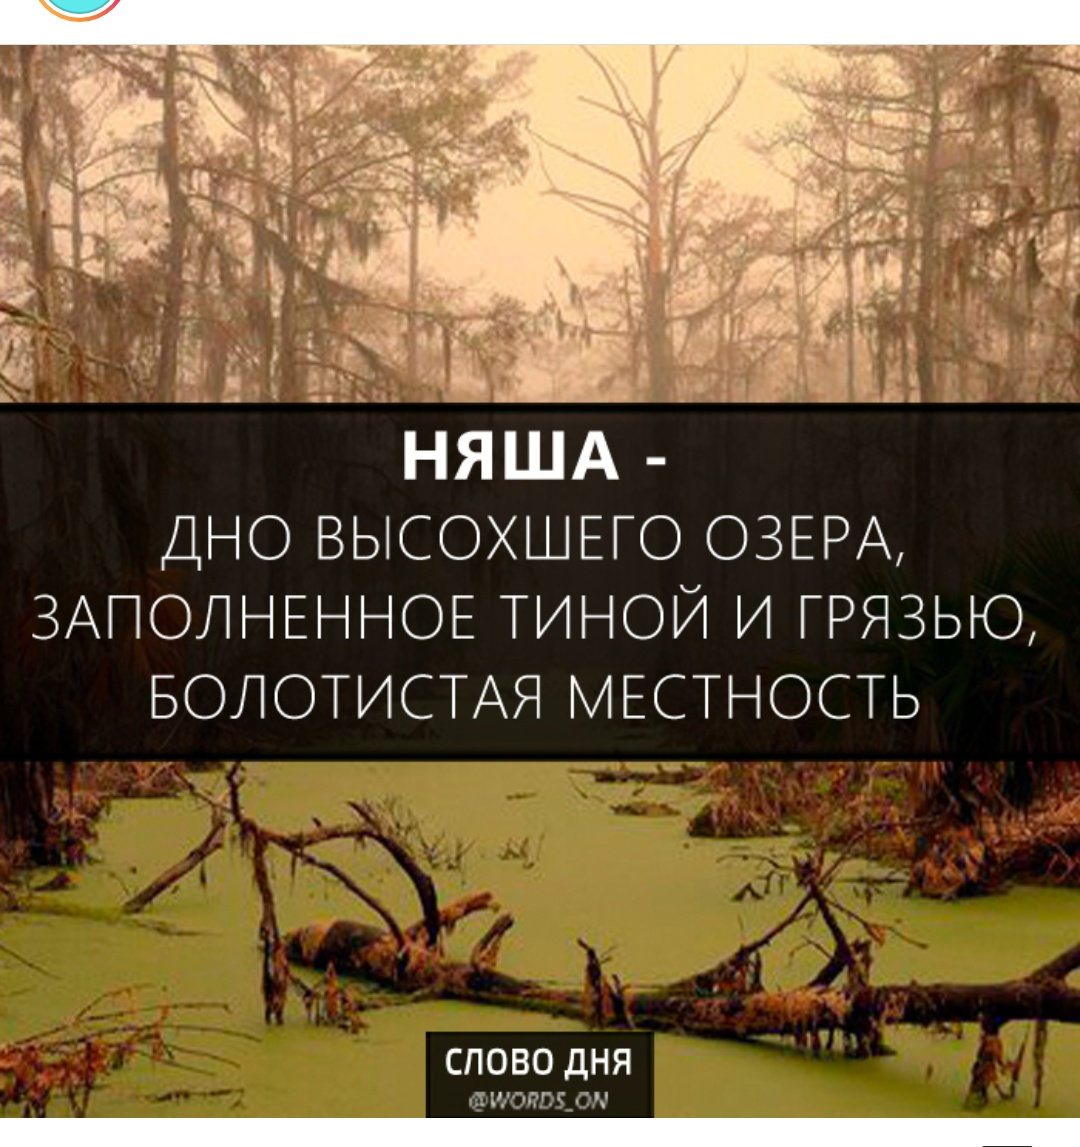 Изба Трепальня - Страница 23 1544090957181958305